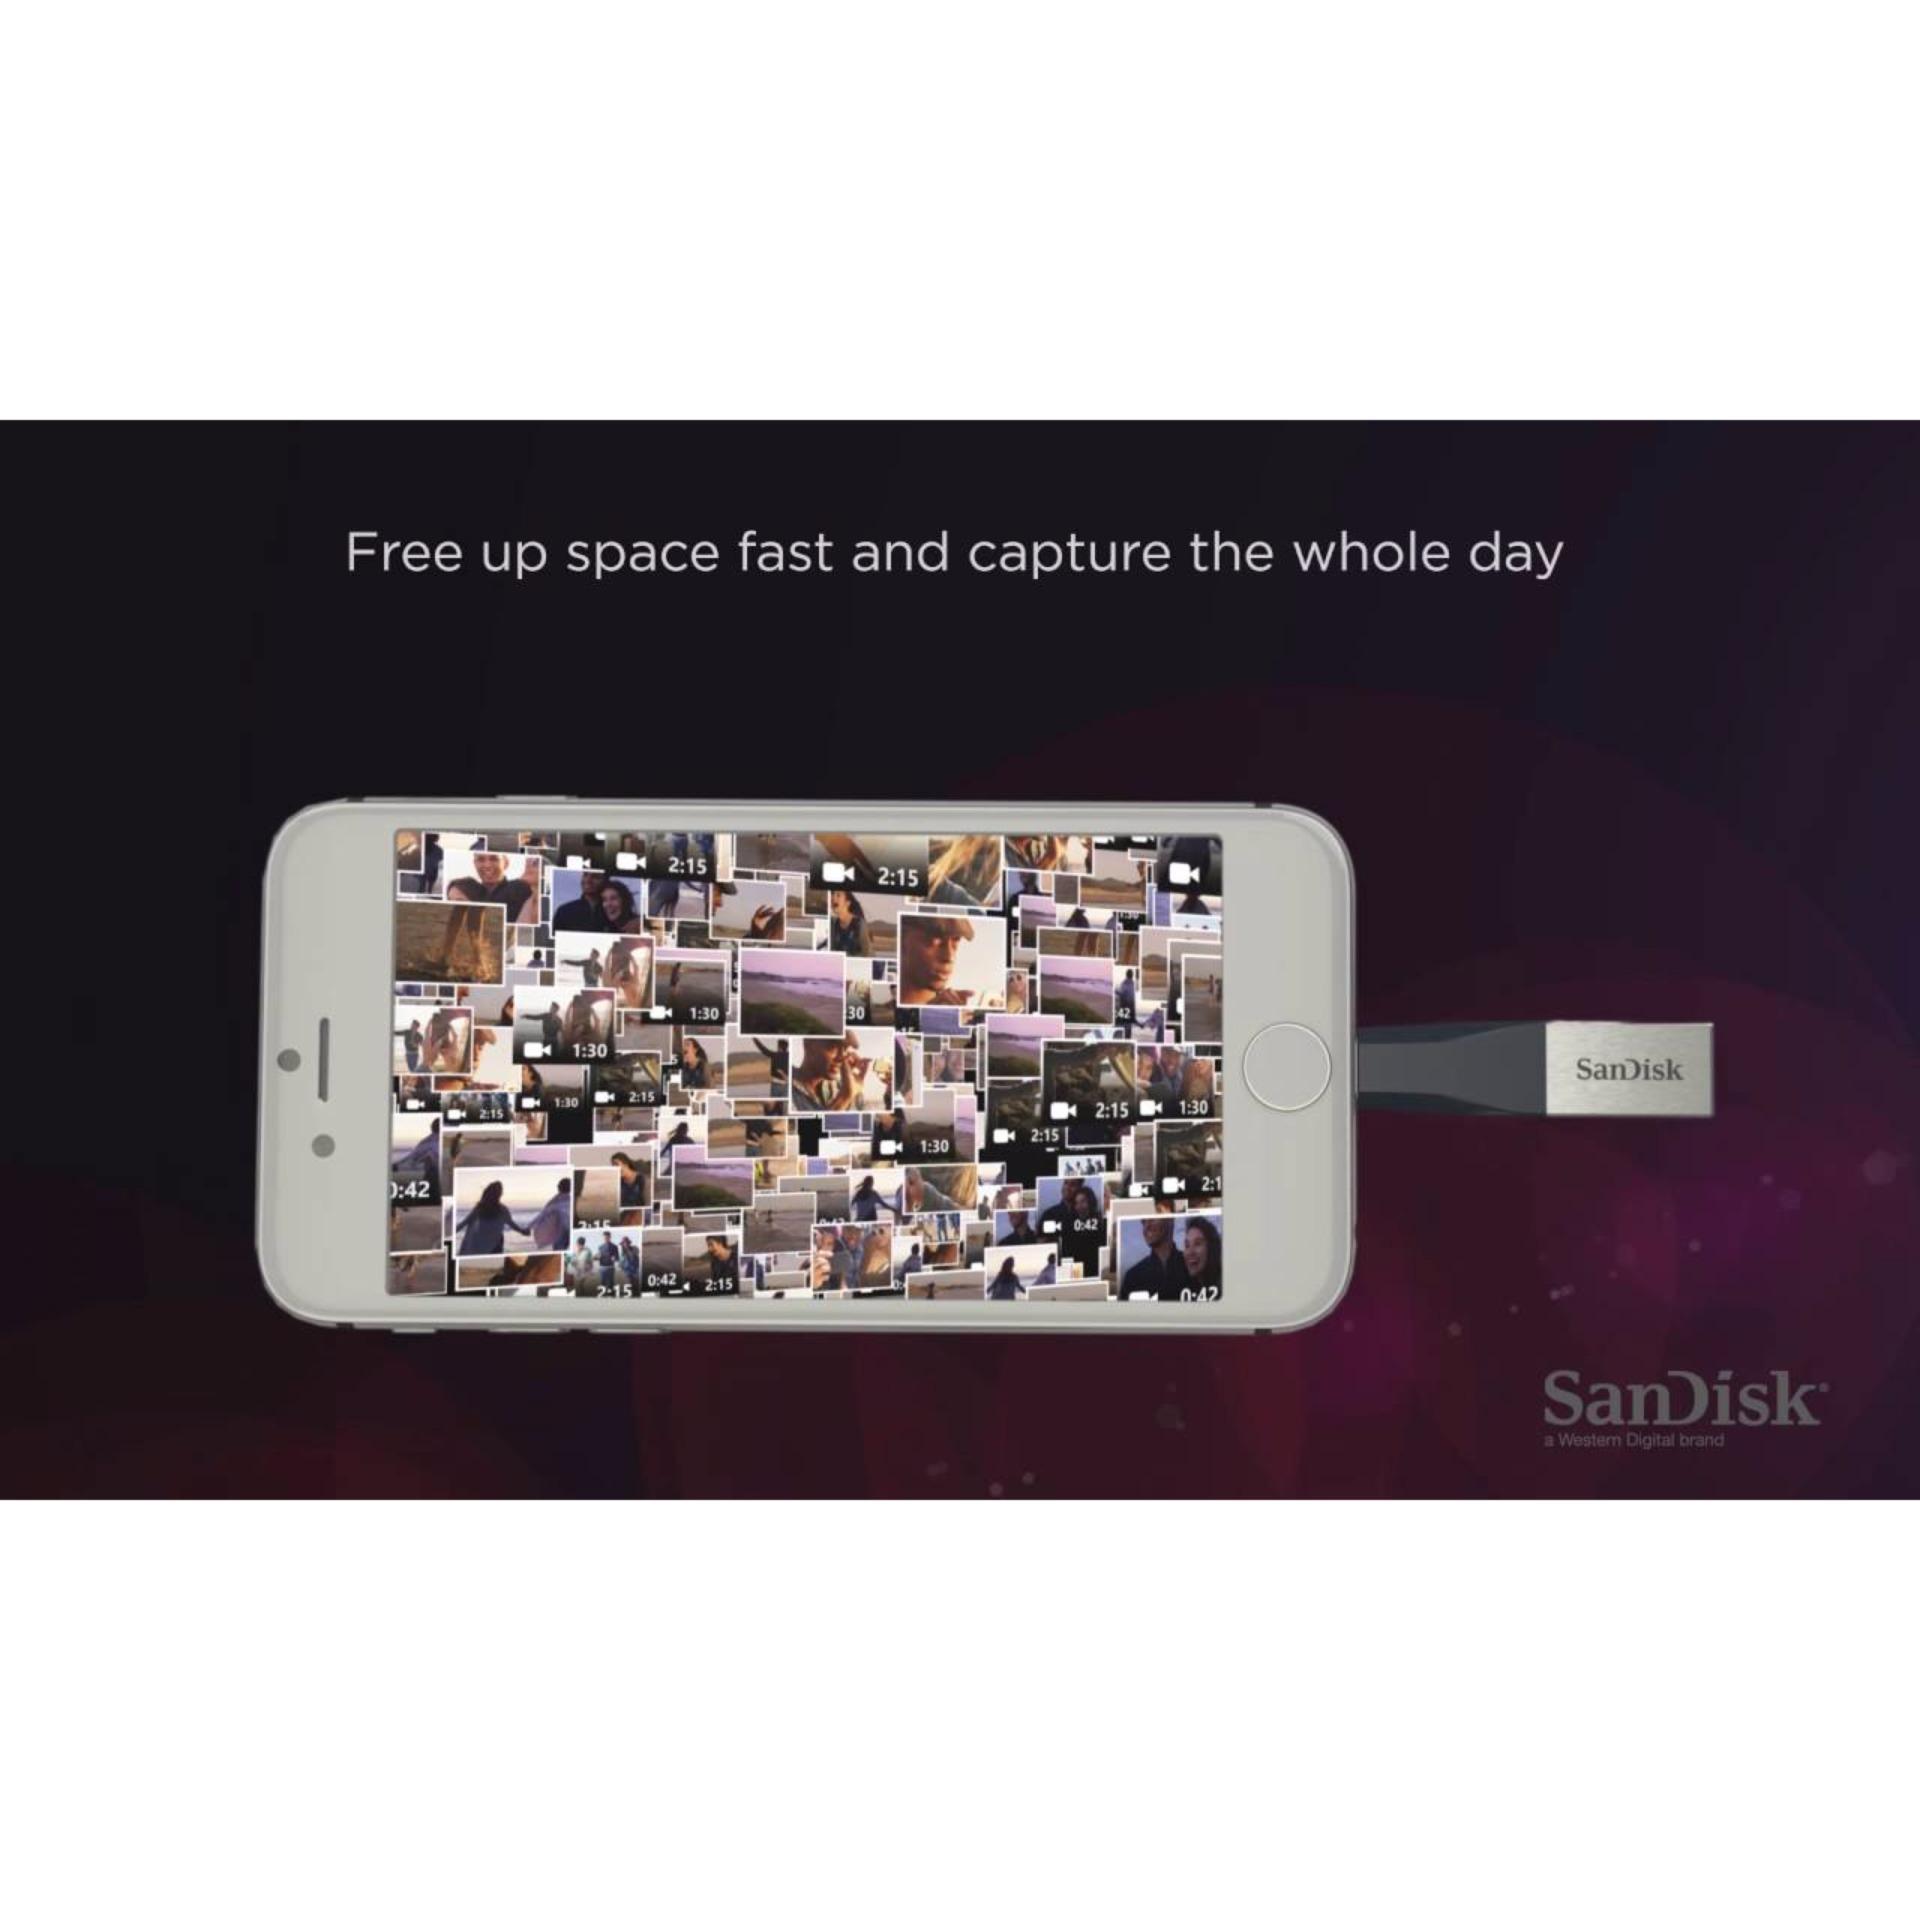 Sandisk Ixpand 128gb Flash Drive For Iphone Ipad Sdix30n 128g Mini Sdix40n 16gb Otg Dual And